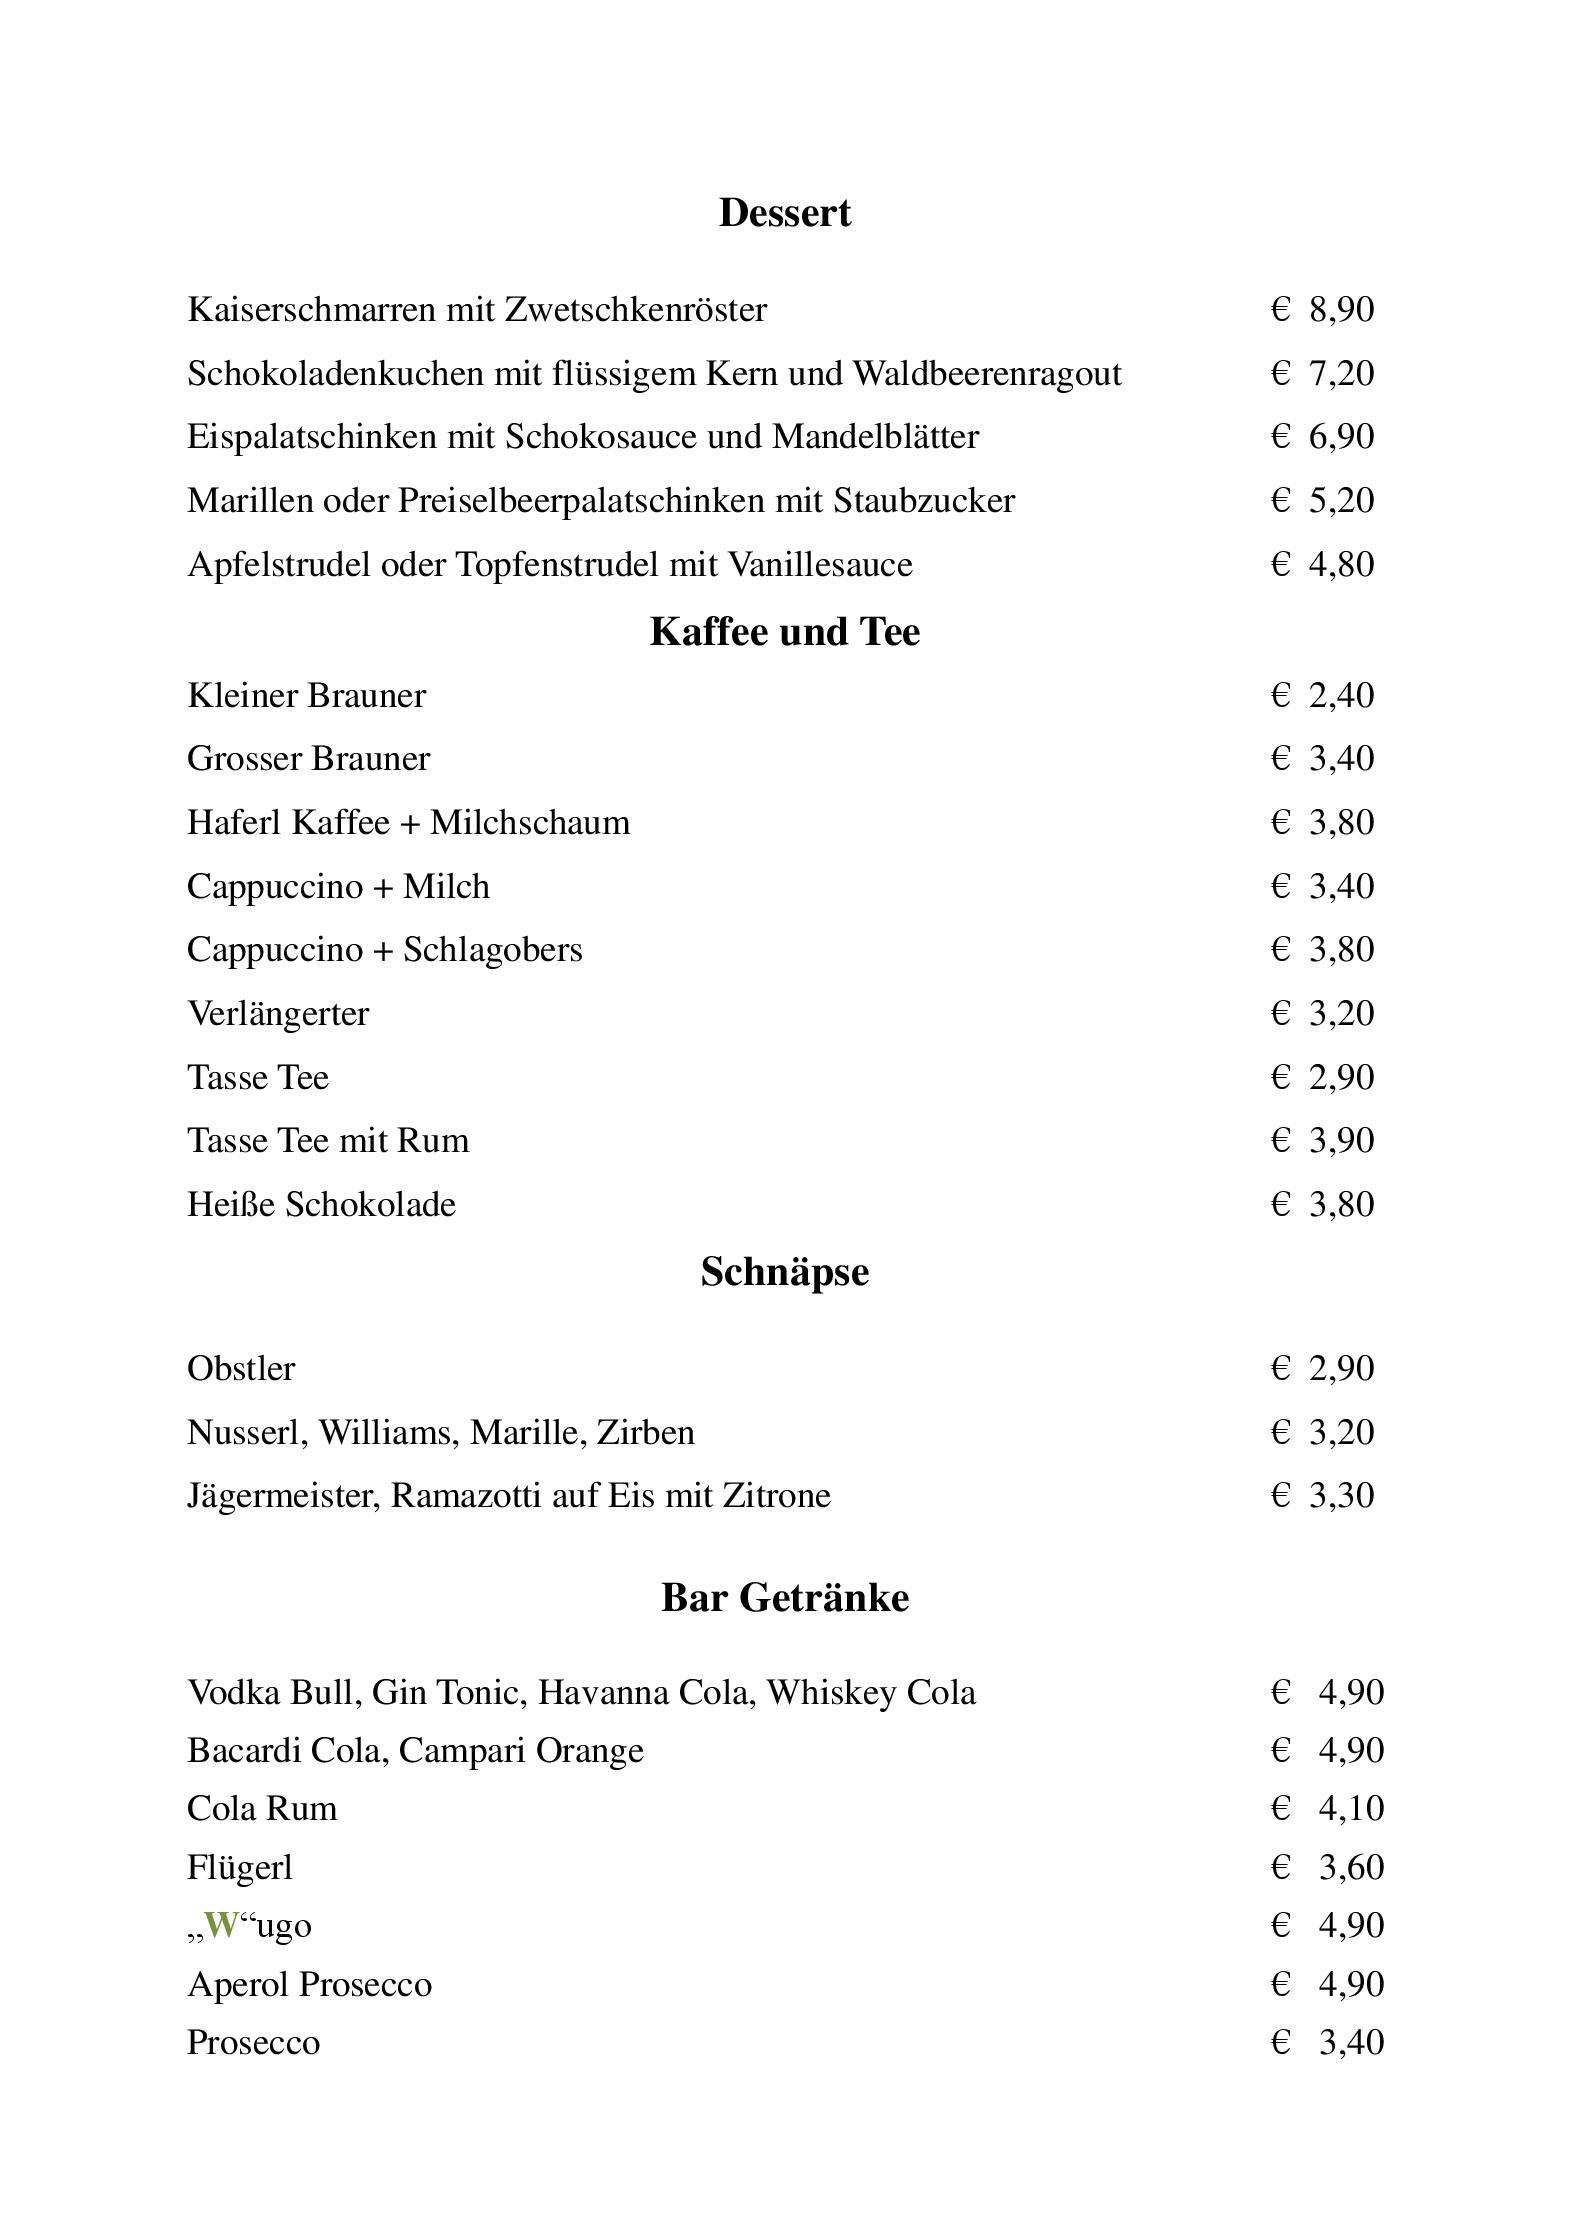 Speisekarte - Restaurant Gasthof Wastlwirt in Salzburg ...